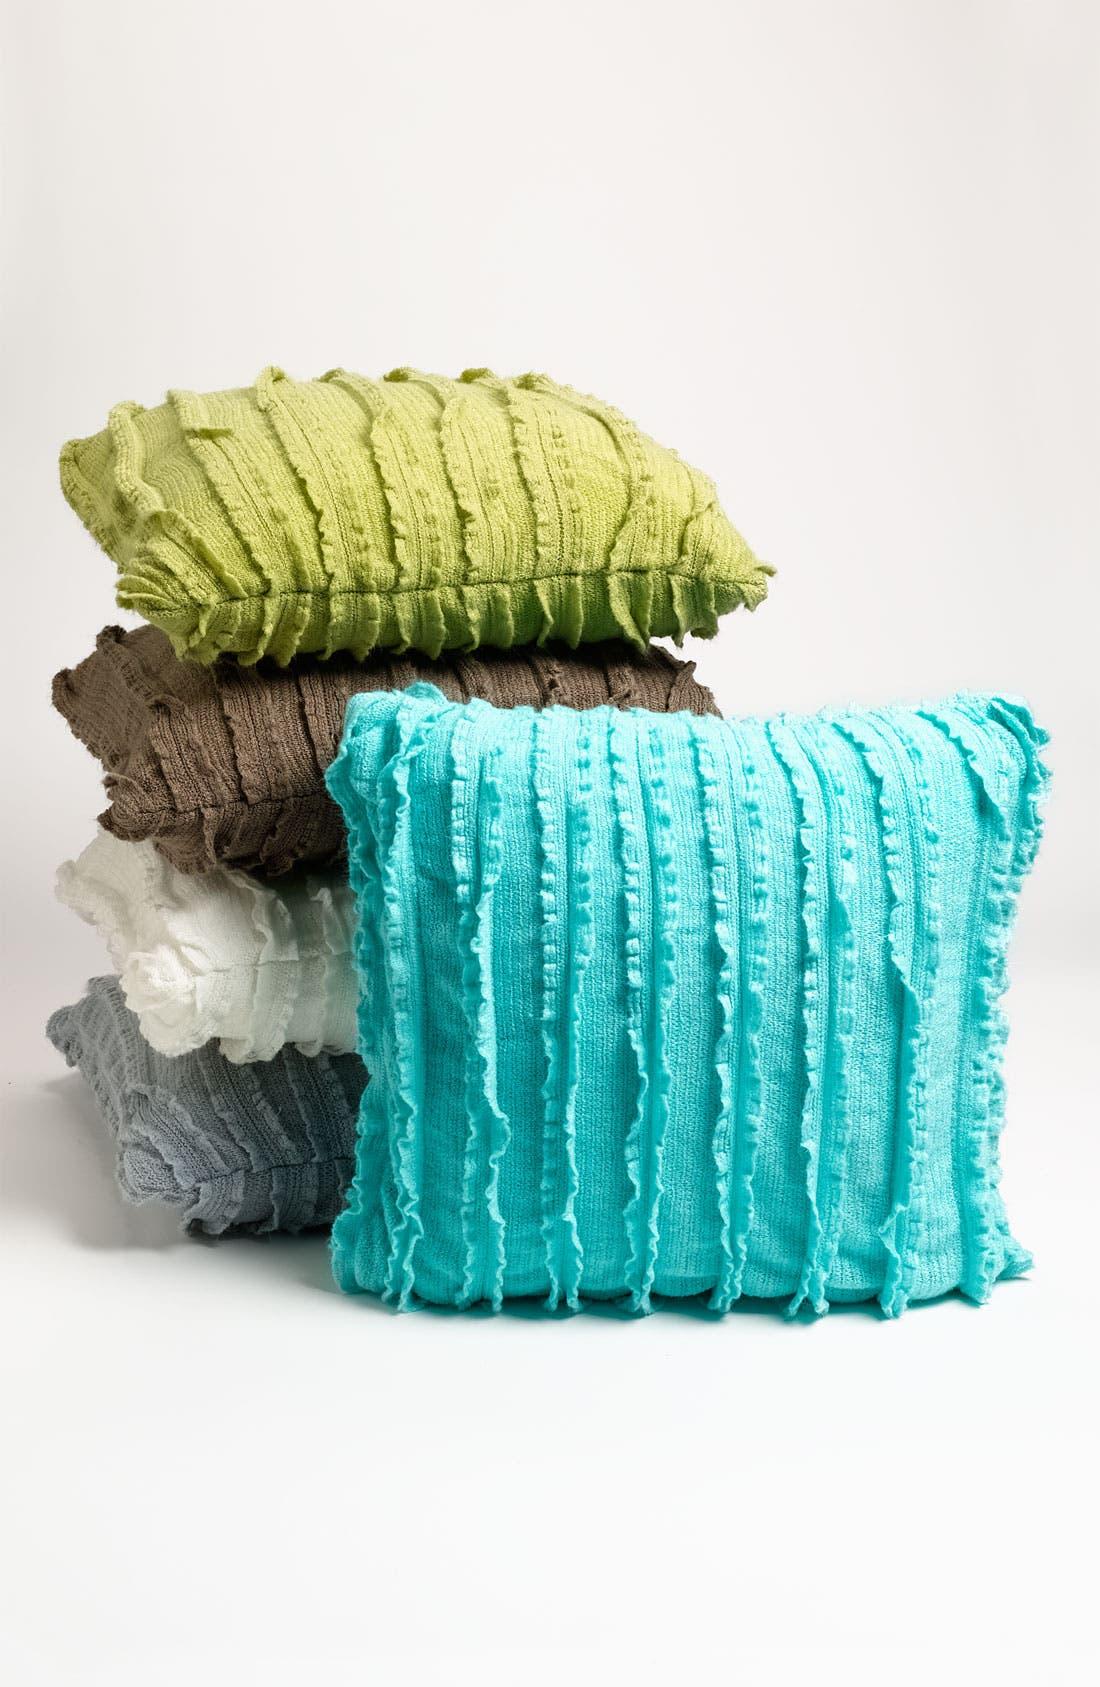 Alternate Image 1 Selected - Kennebunk 'Flirty' Pillow